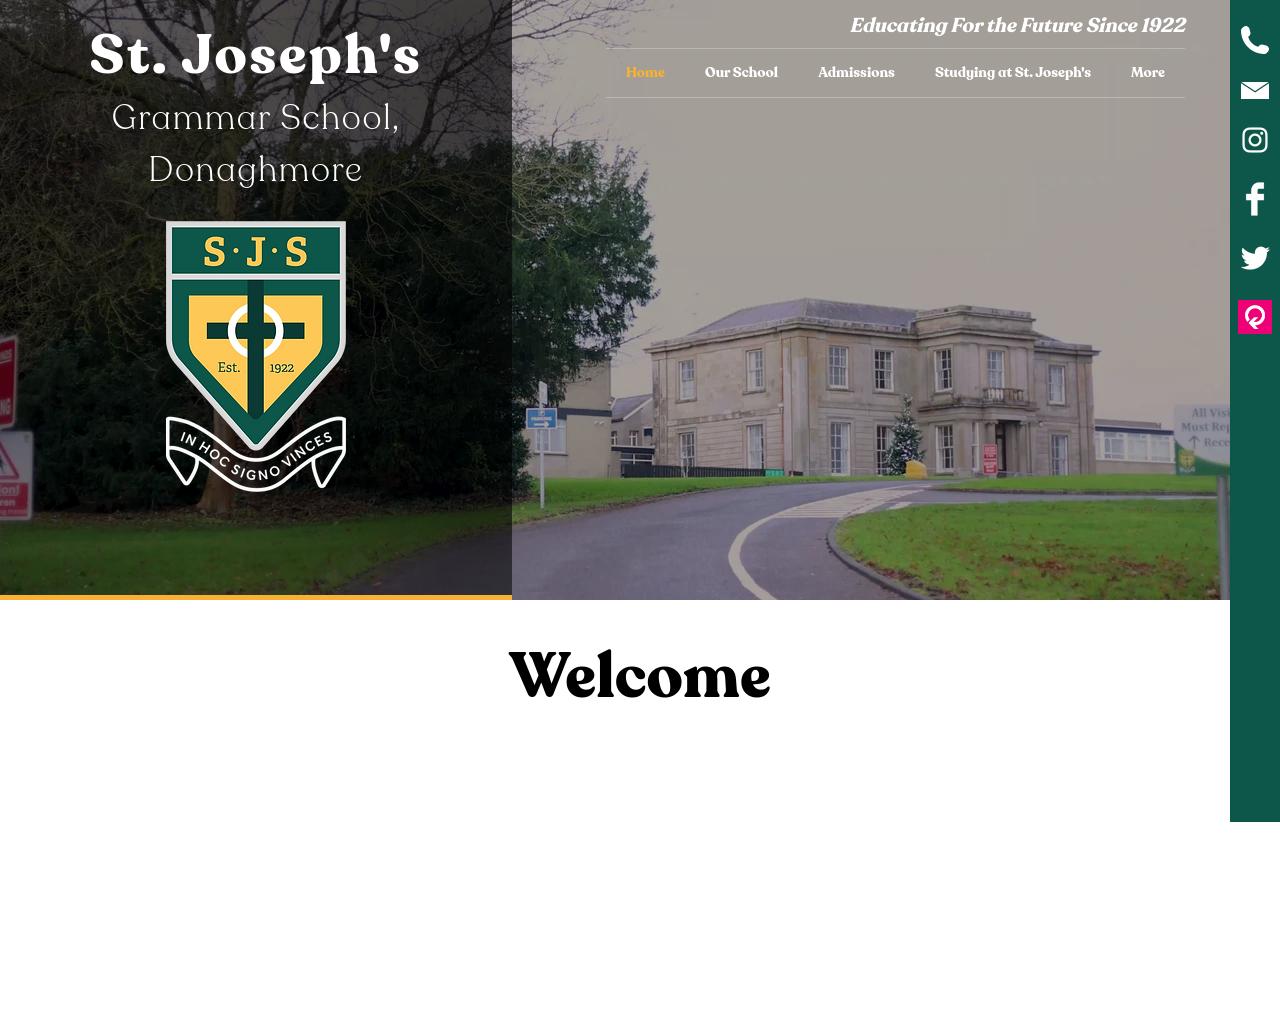 St Joseph's Donaghmore